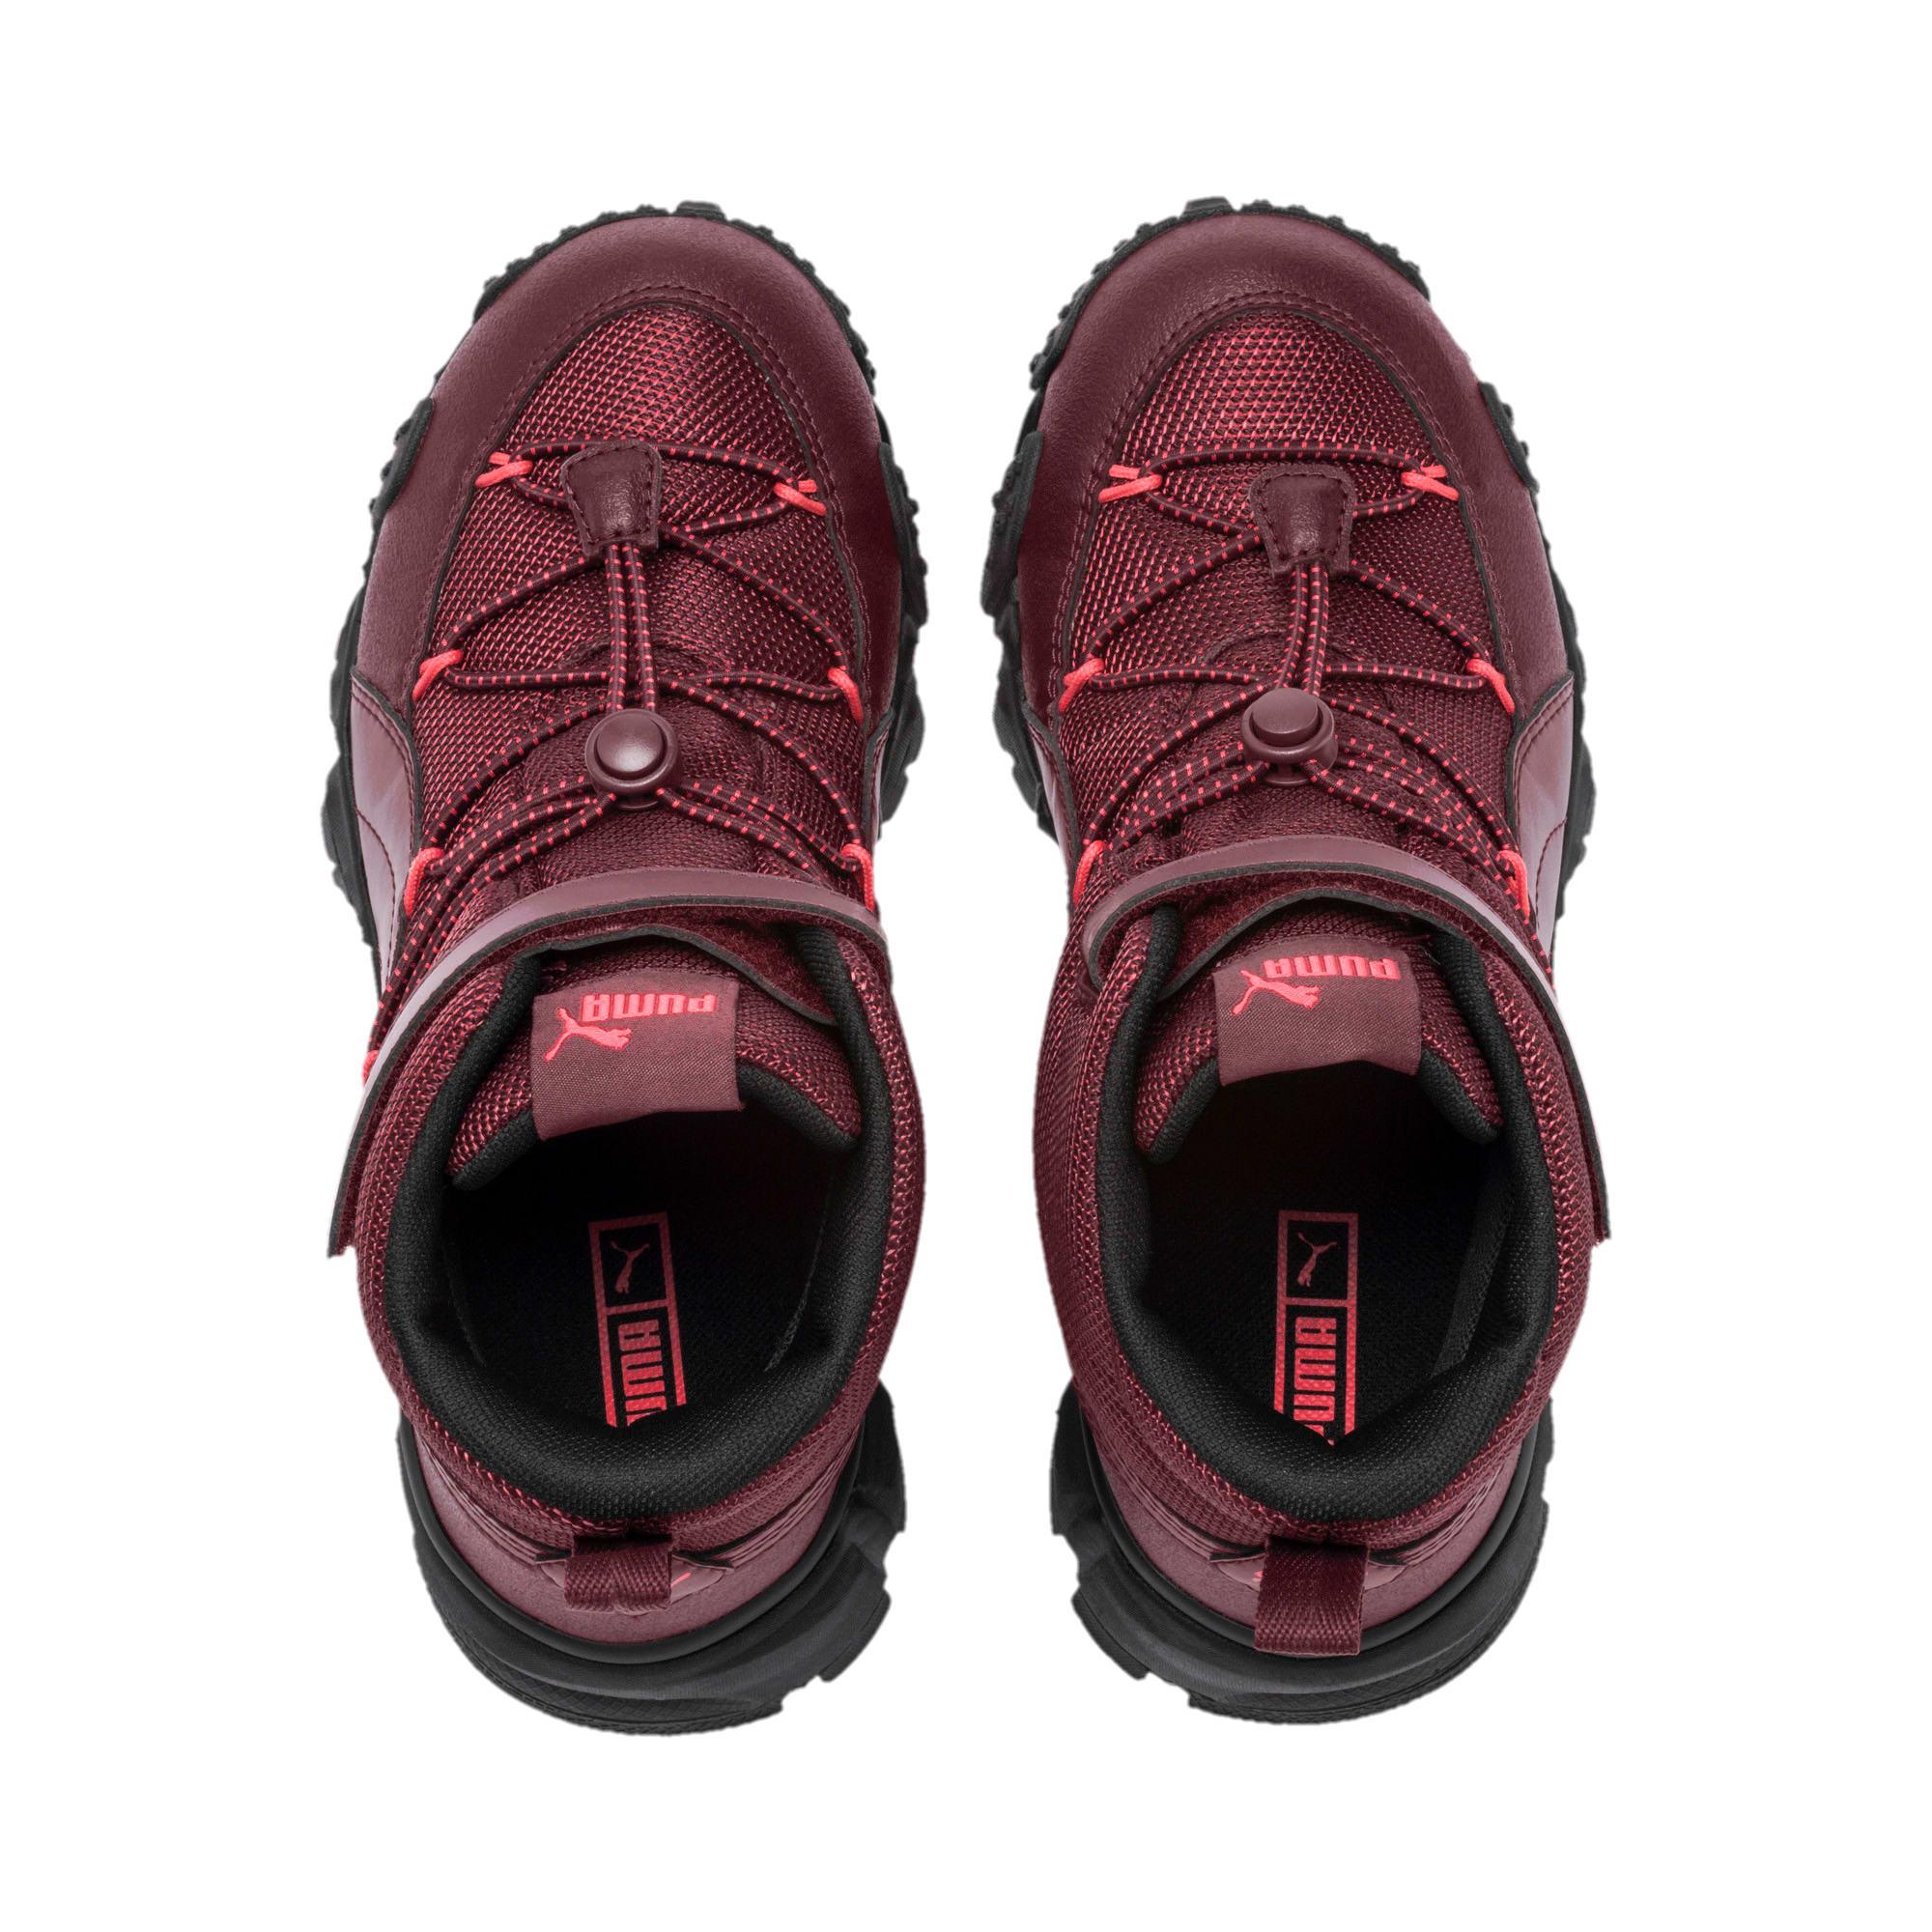 Thumbnail 6 of Maka PURETEX Boots JR, Vineyard Wine -Calypso Coral, medium